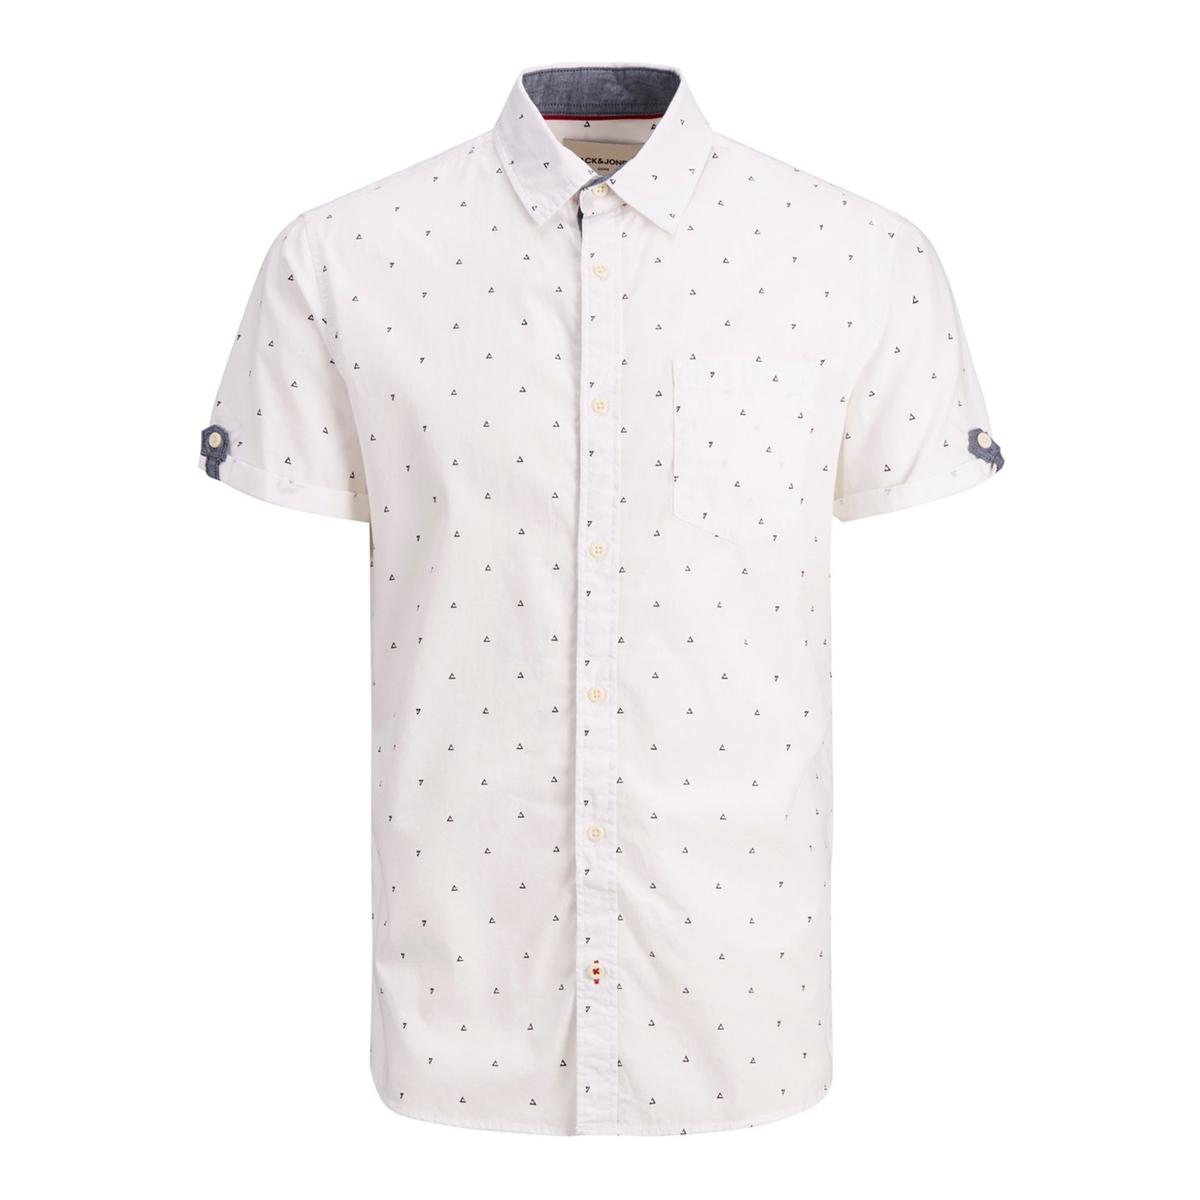 Camisa slim estampada Jcomars